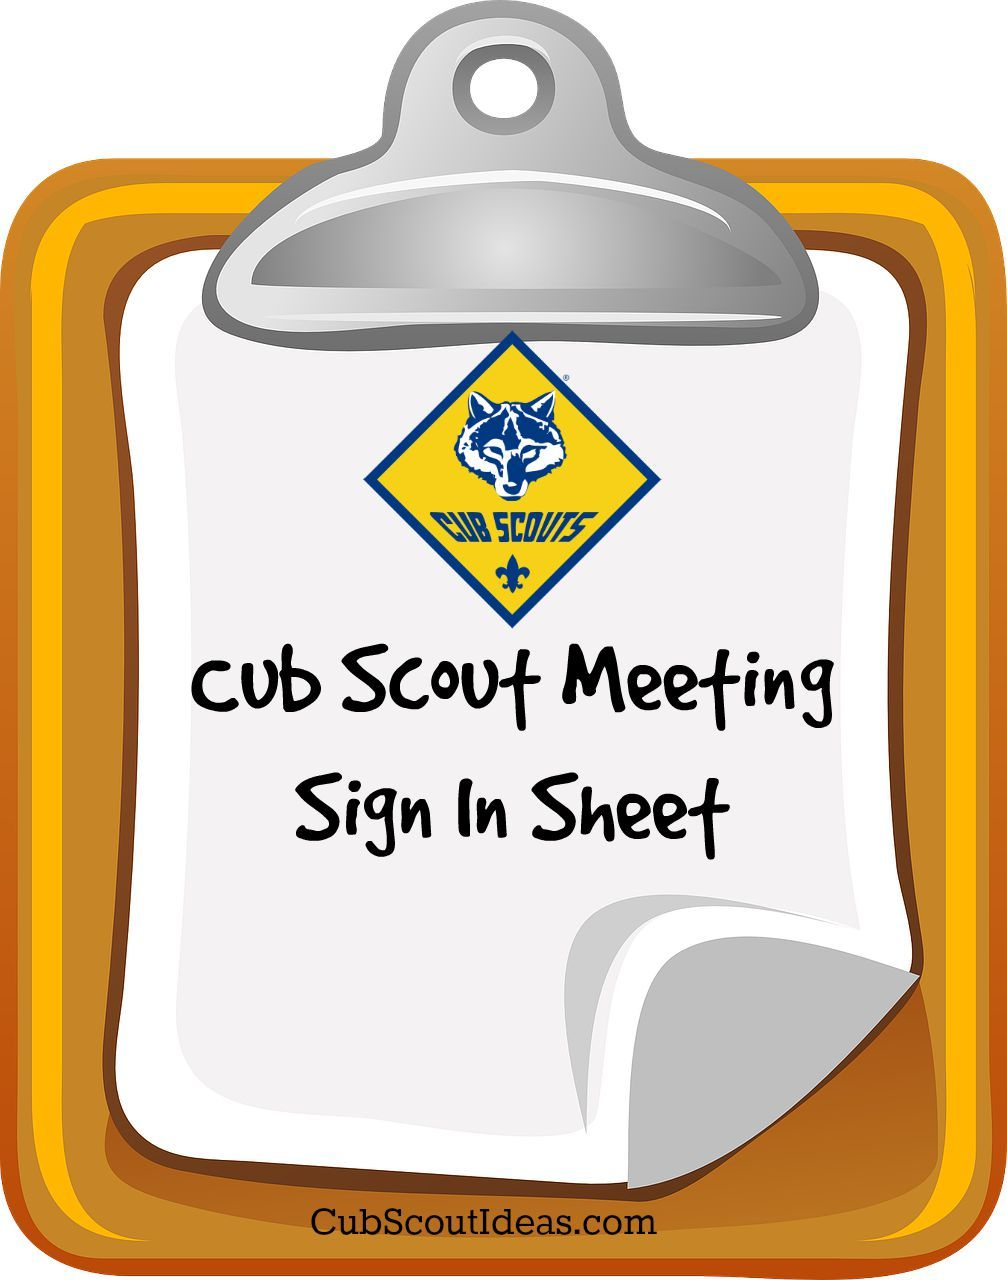 attendance sheet for cub scouts cub scouts pinterest cub